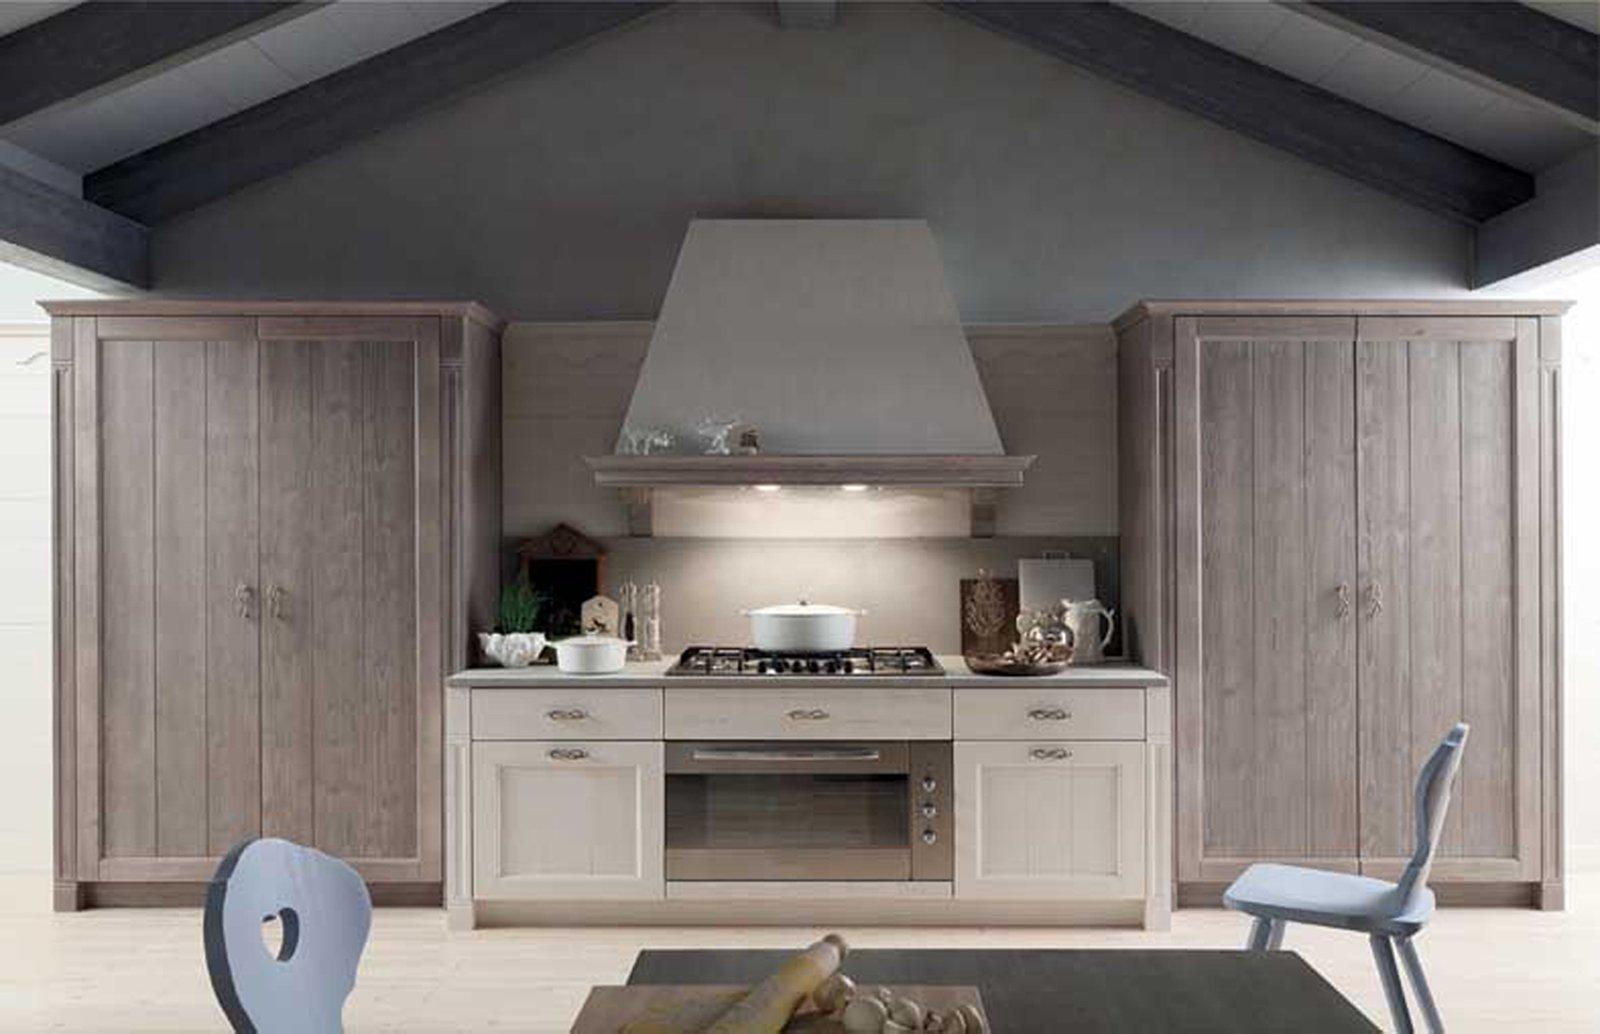 Cucina in legno moderna o classica cose di casa - Cucina con dispensa ...